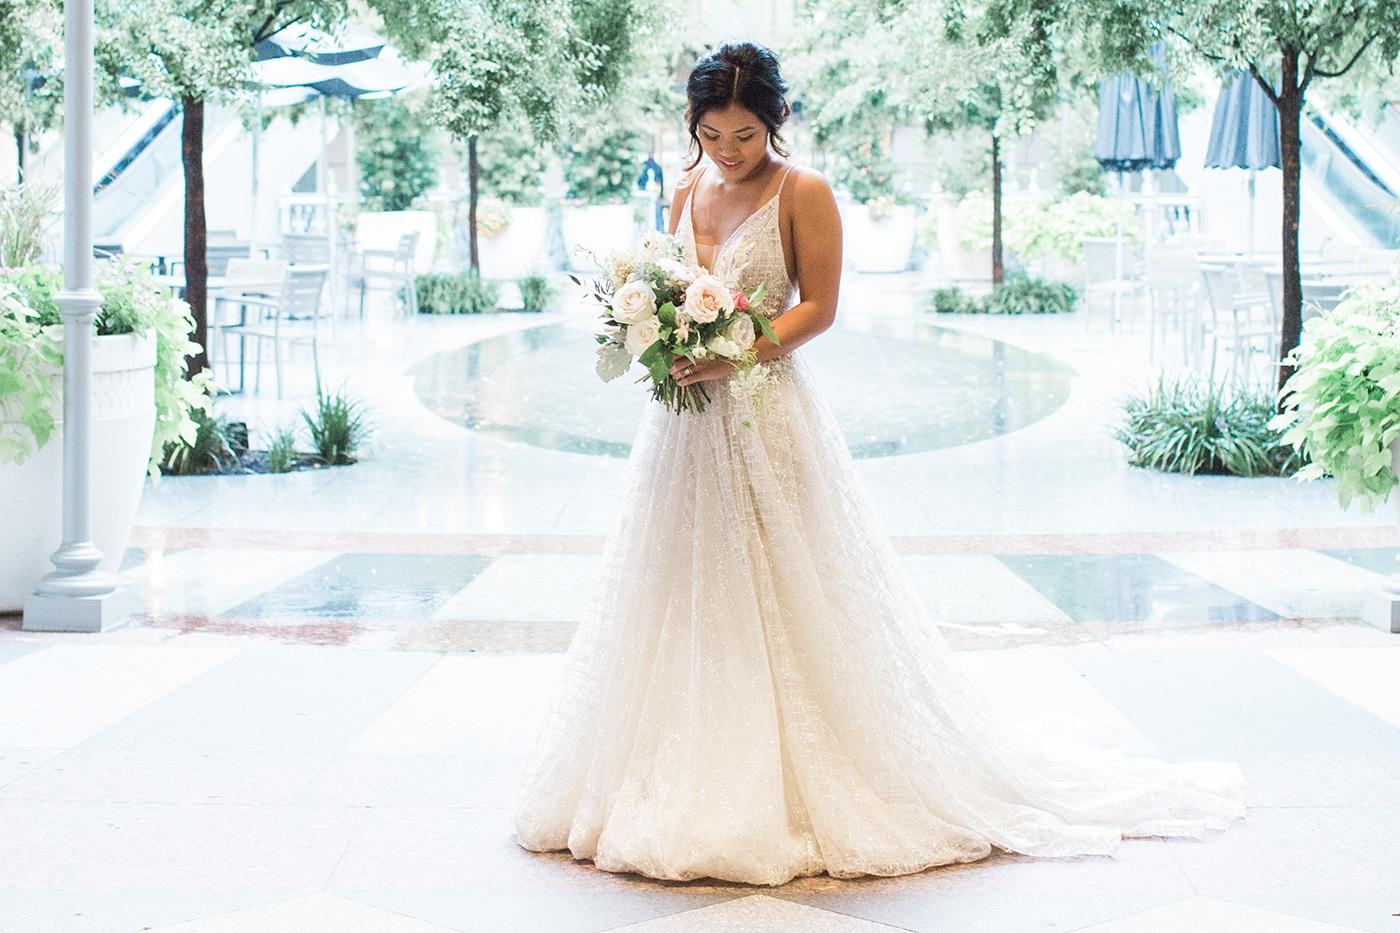 Dallas Wedding Planner - Hotel Crescent Court Dallas - Allday Events - 9.jpg